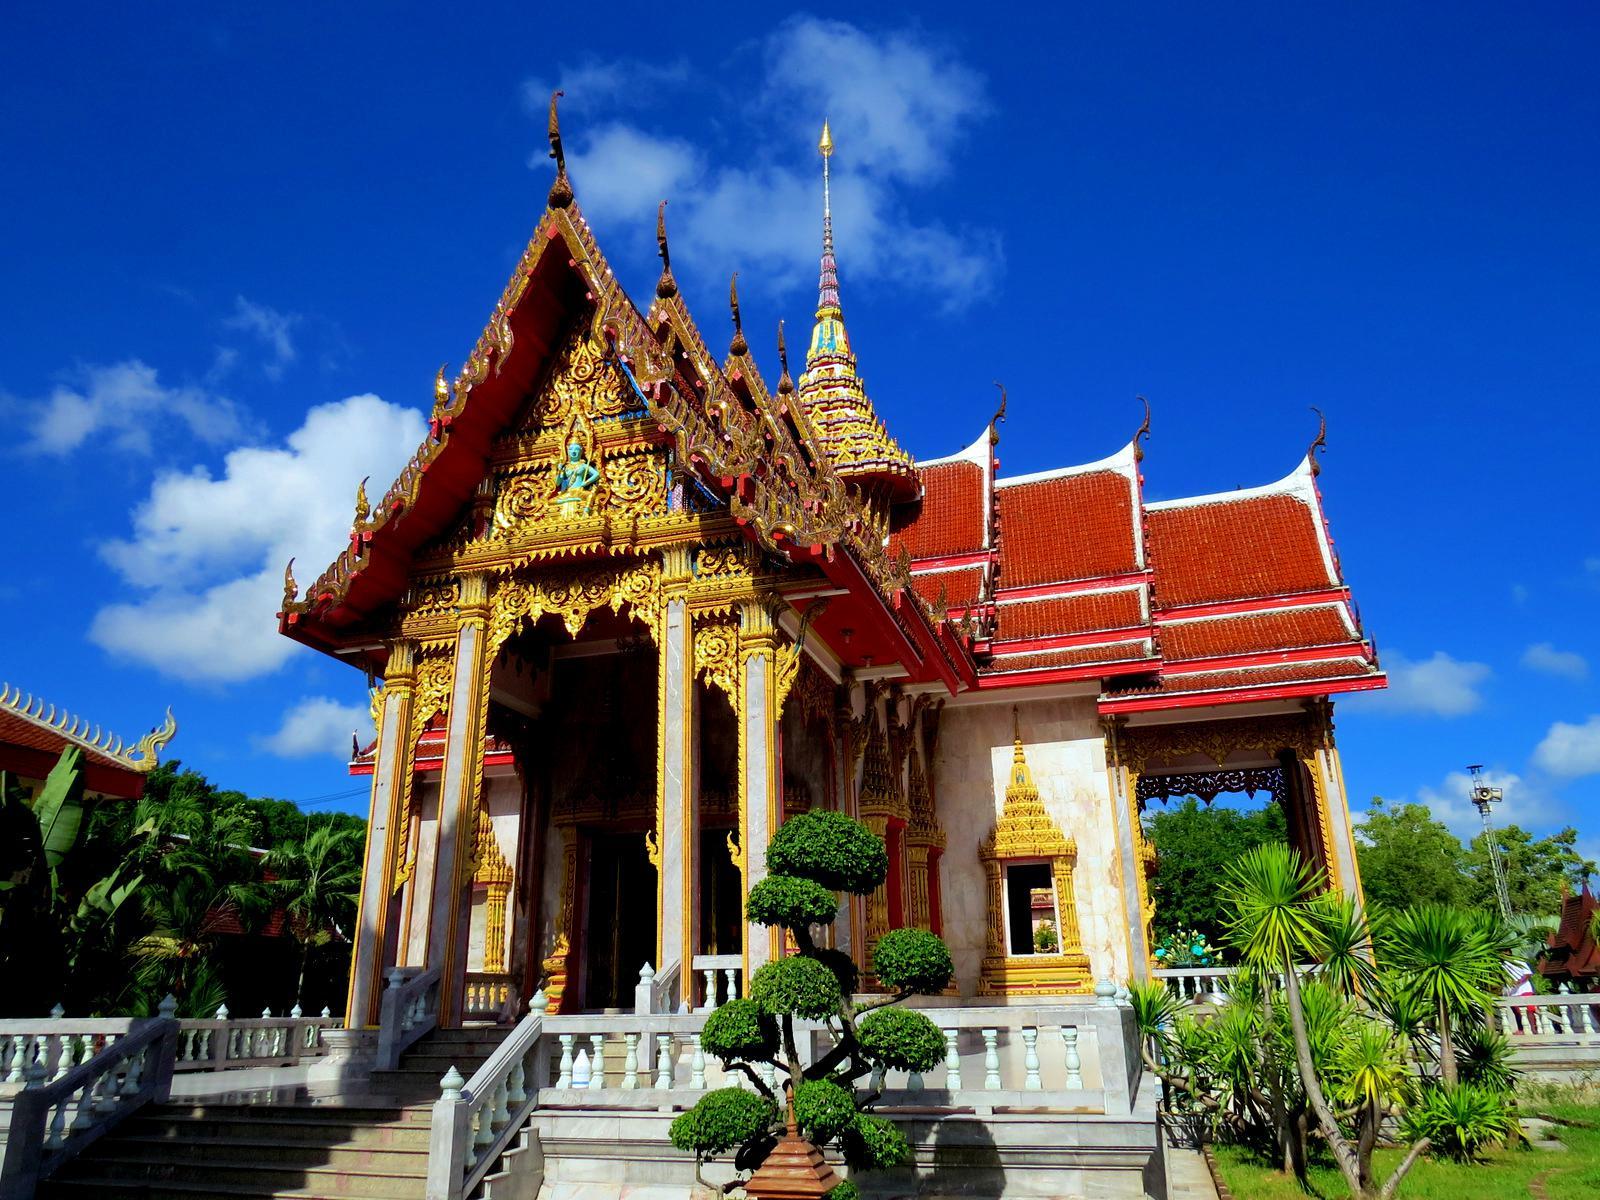 Wat_Chalong_temple.jpg?1537440544